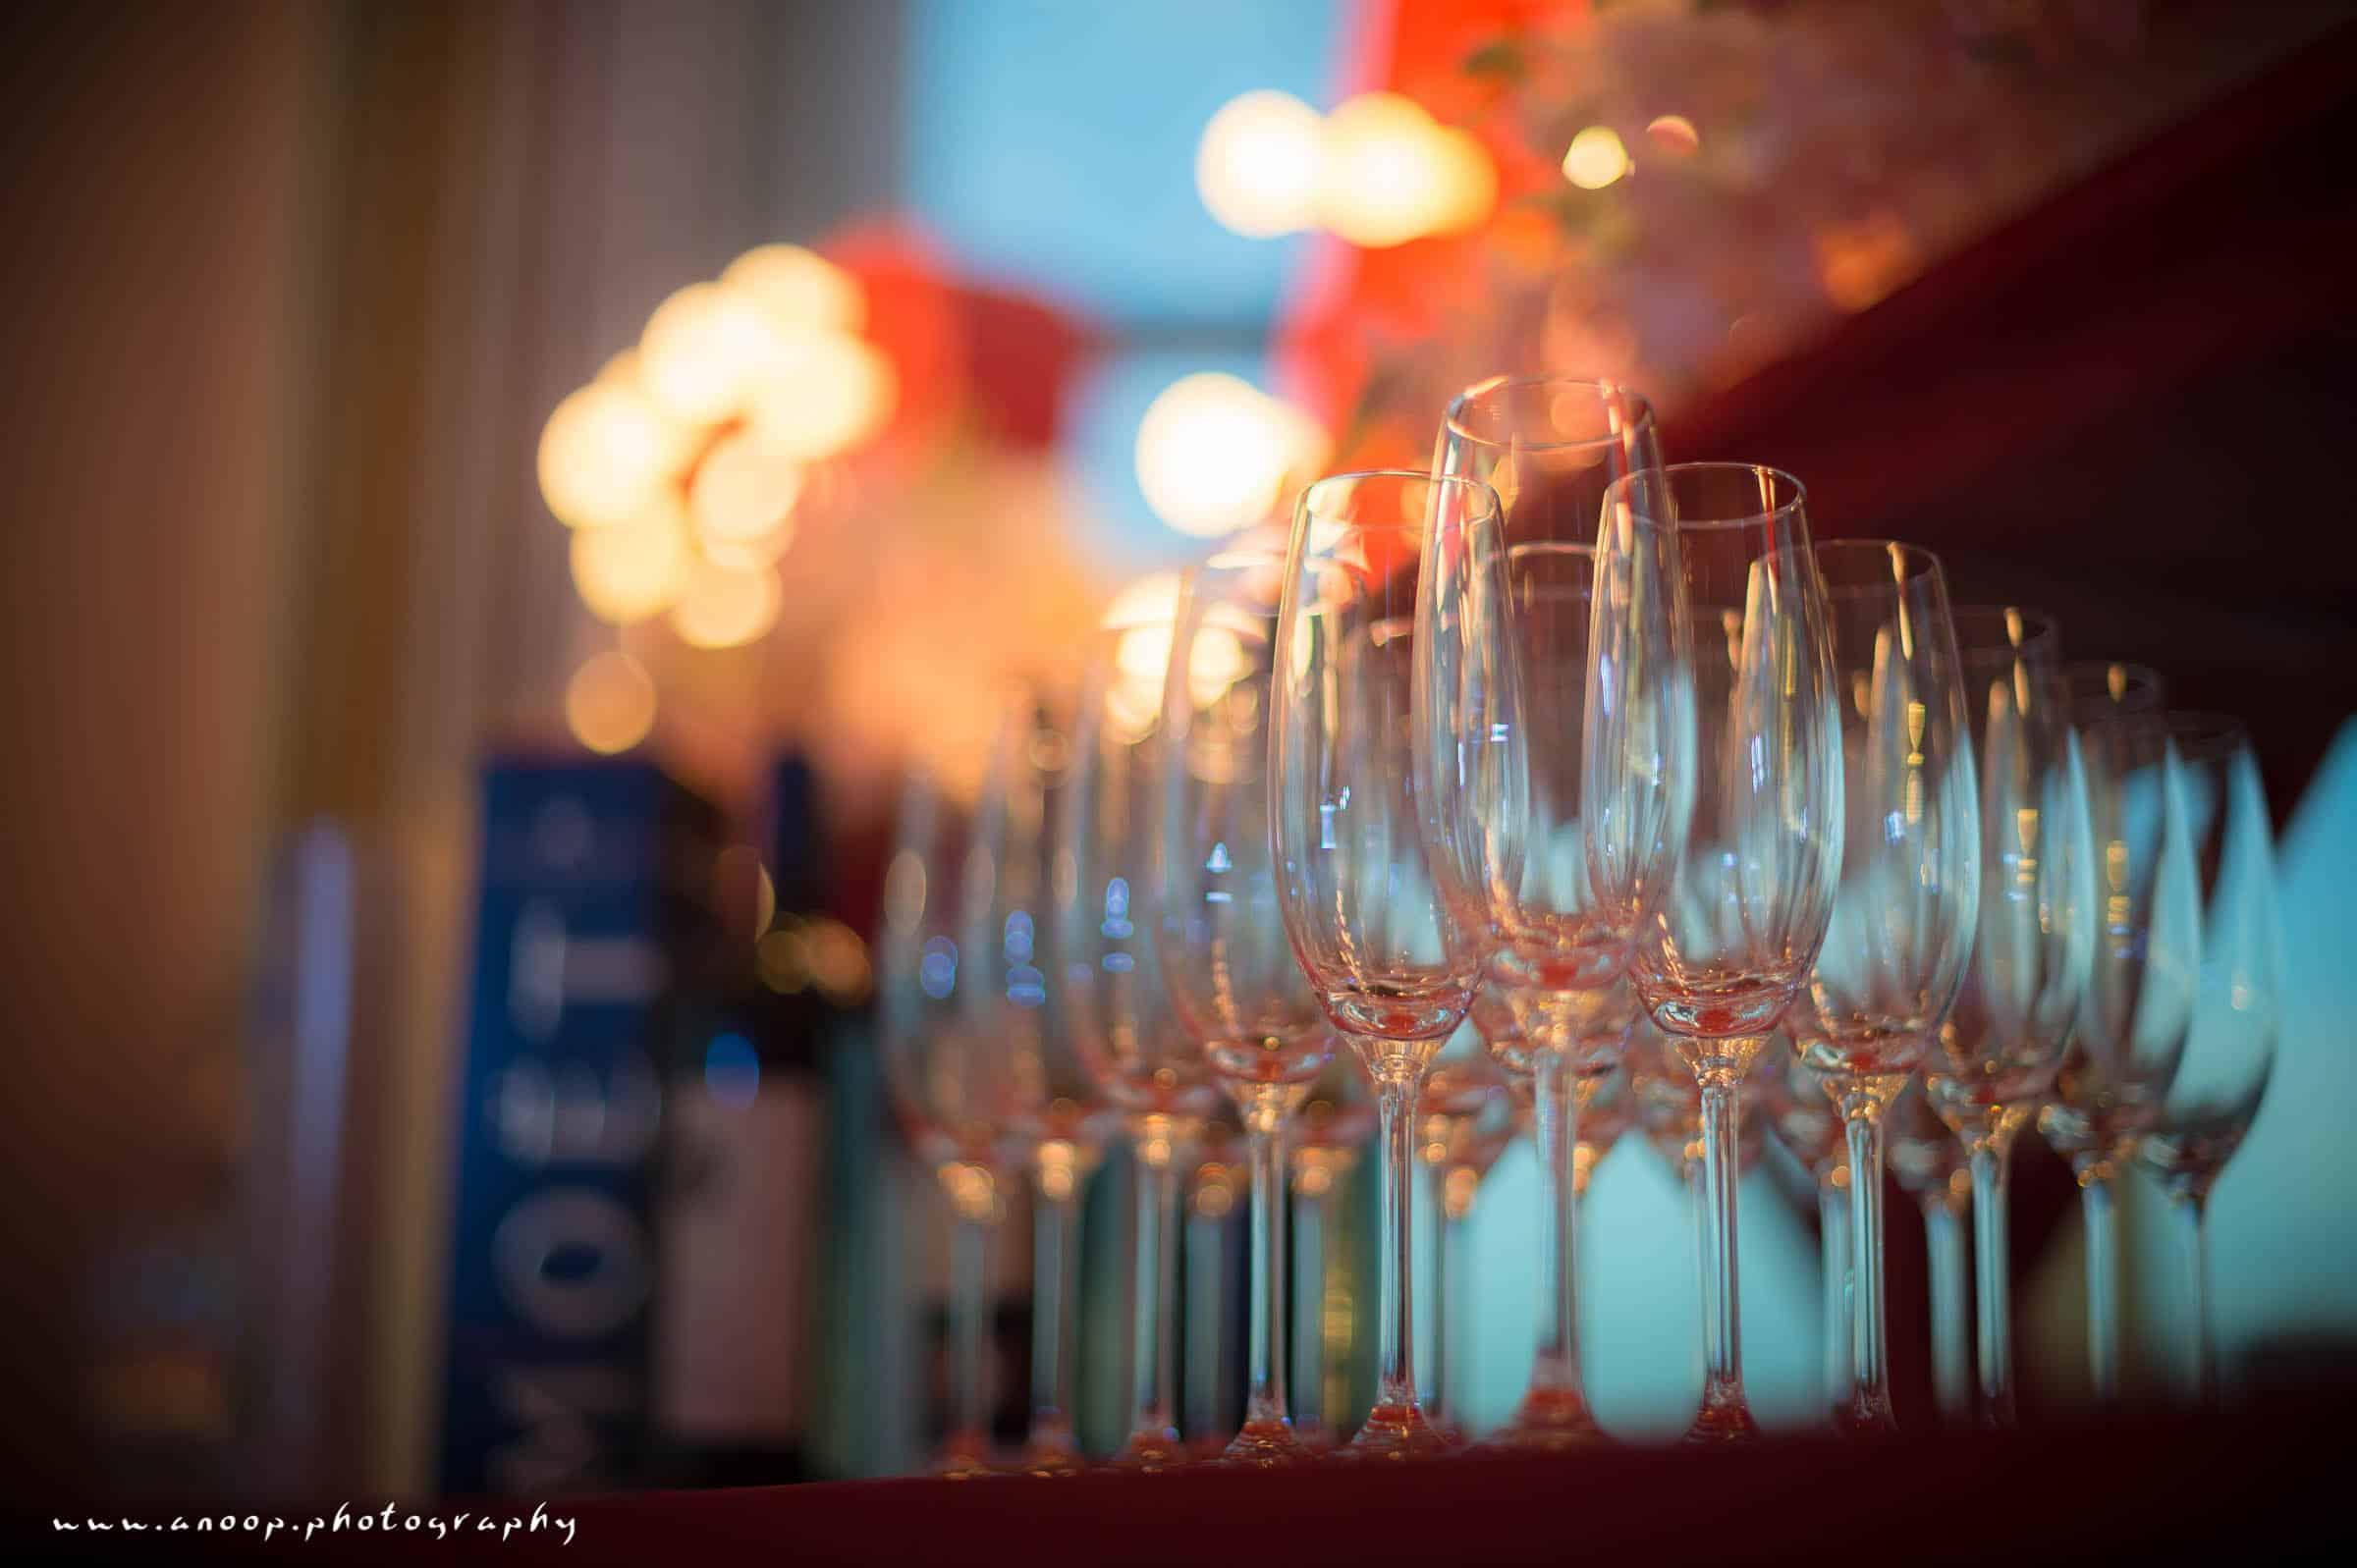 anantara-avani-riverside-bangkok-ballroom-celebrations-5 | best photographer